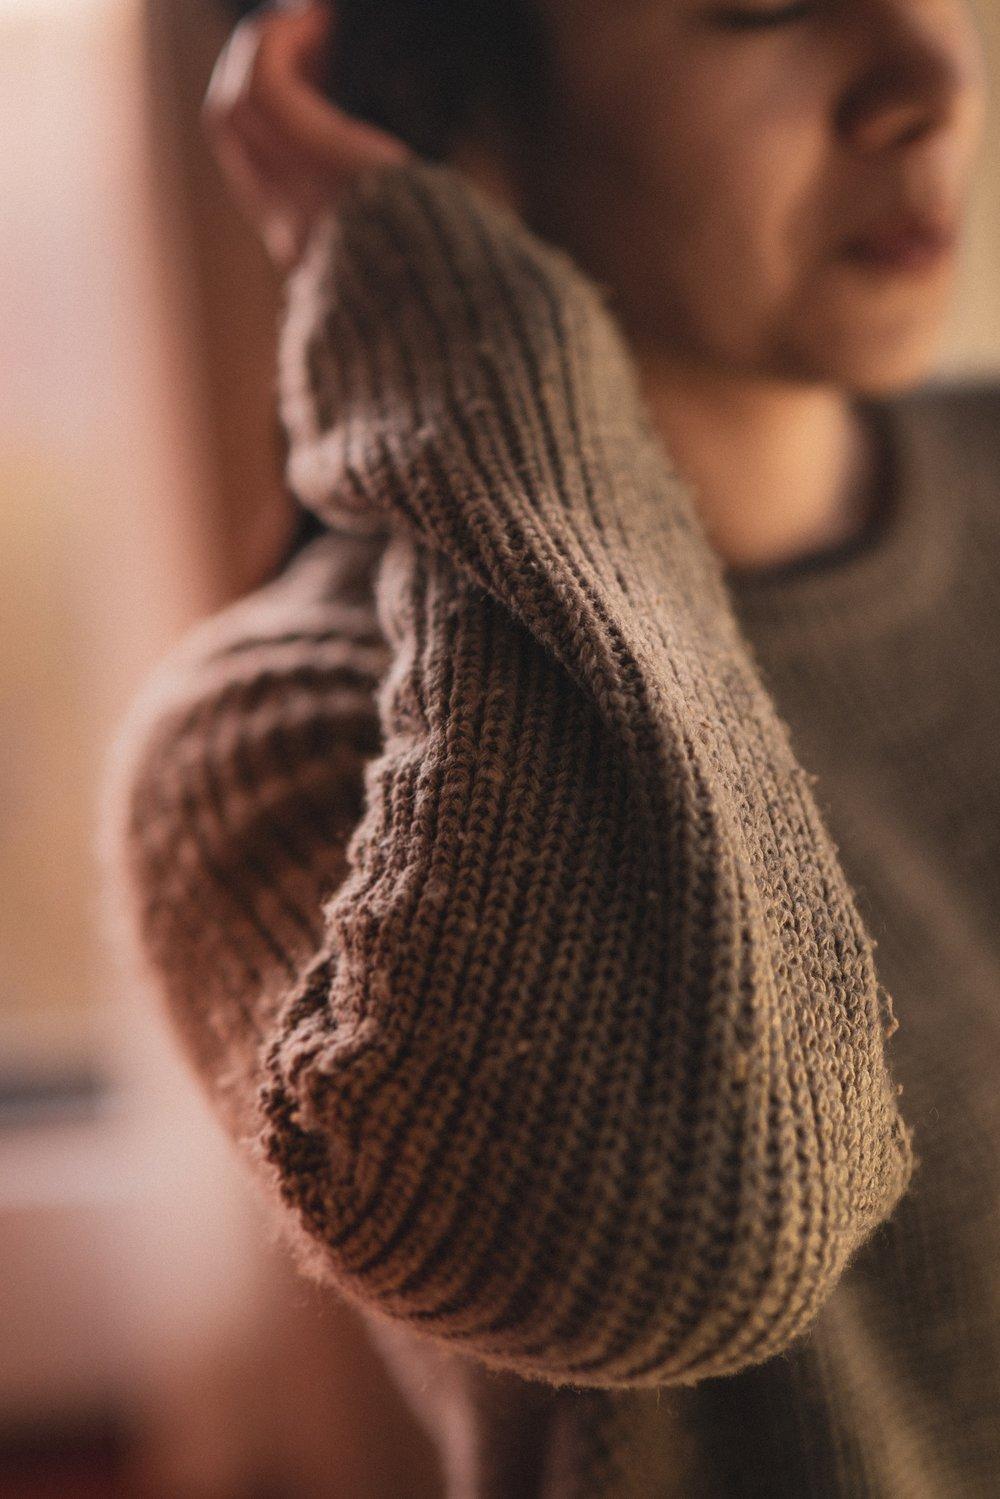 sayo-garcia-1319244-unsplash sweater pill.jpg